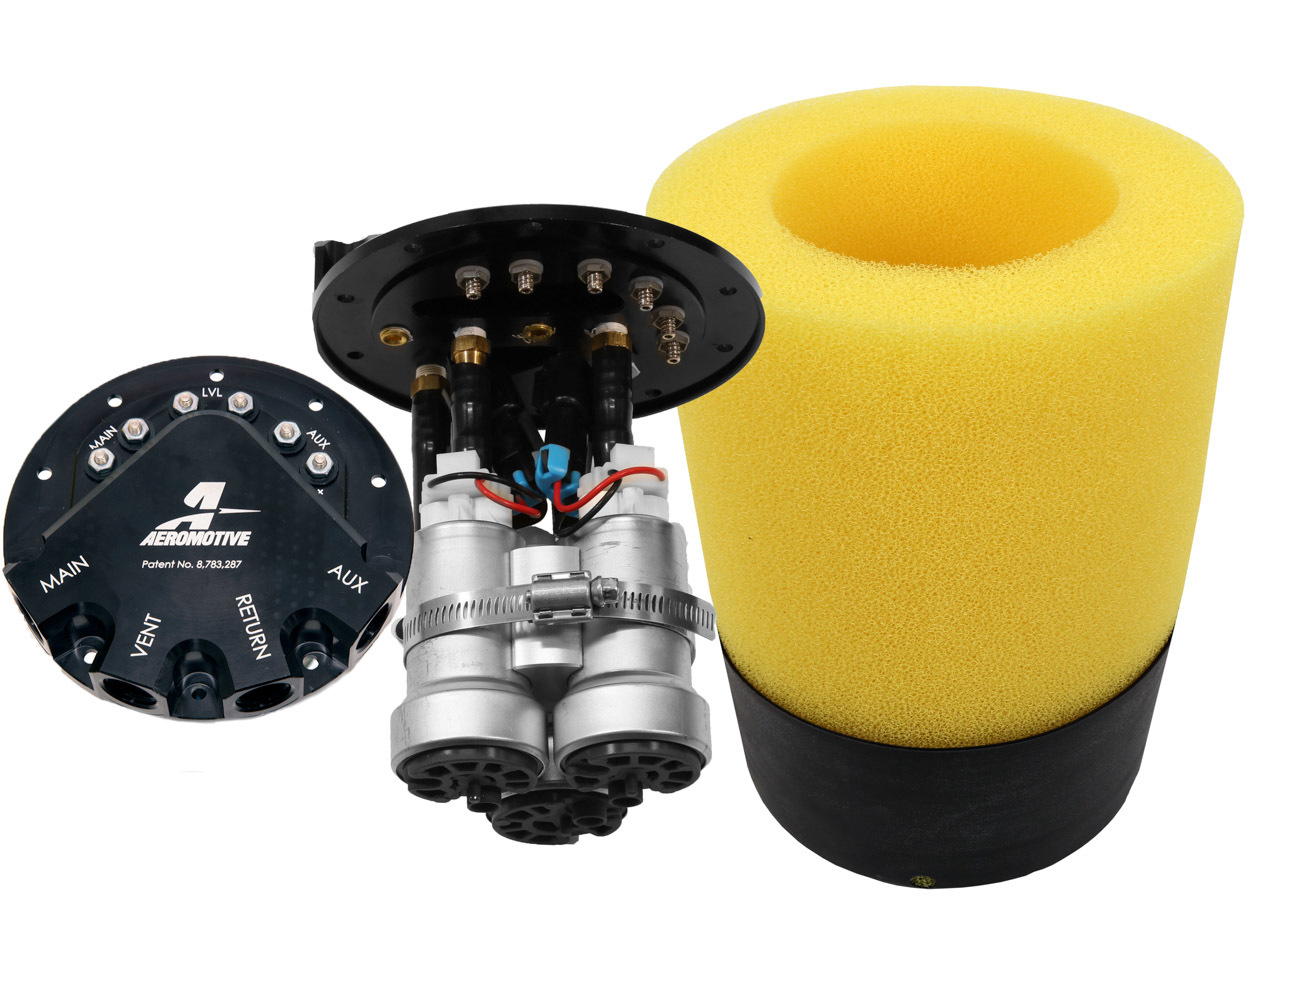 Aeromotive 18364 Fuel Pump, Phantom, Electric, In-Tank, 450 lph at 45 psi, Triple Pump, Center Filter Sock Inlet, 8 AN Outlet / Return / Vent, Install Kit, Gas, GM Fullsize Truck 2005-17, Kit